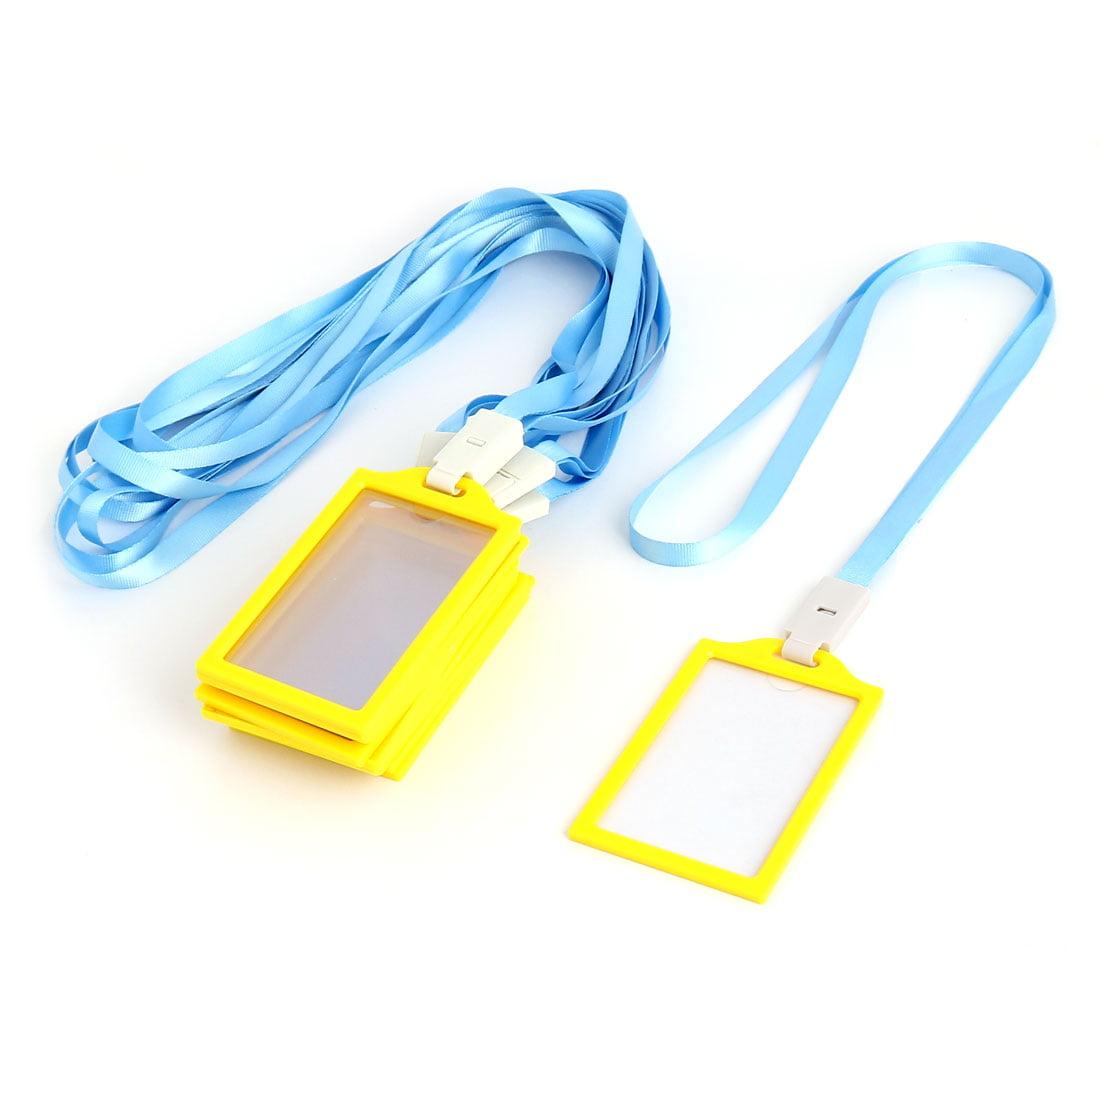 Office School Plastic Vertical Dustproof Name Tag Holder Yellow Sky Blue 10 Pcs